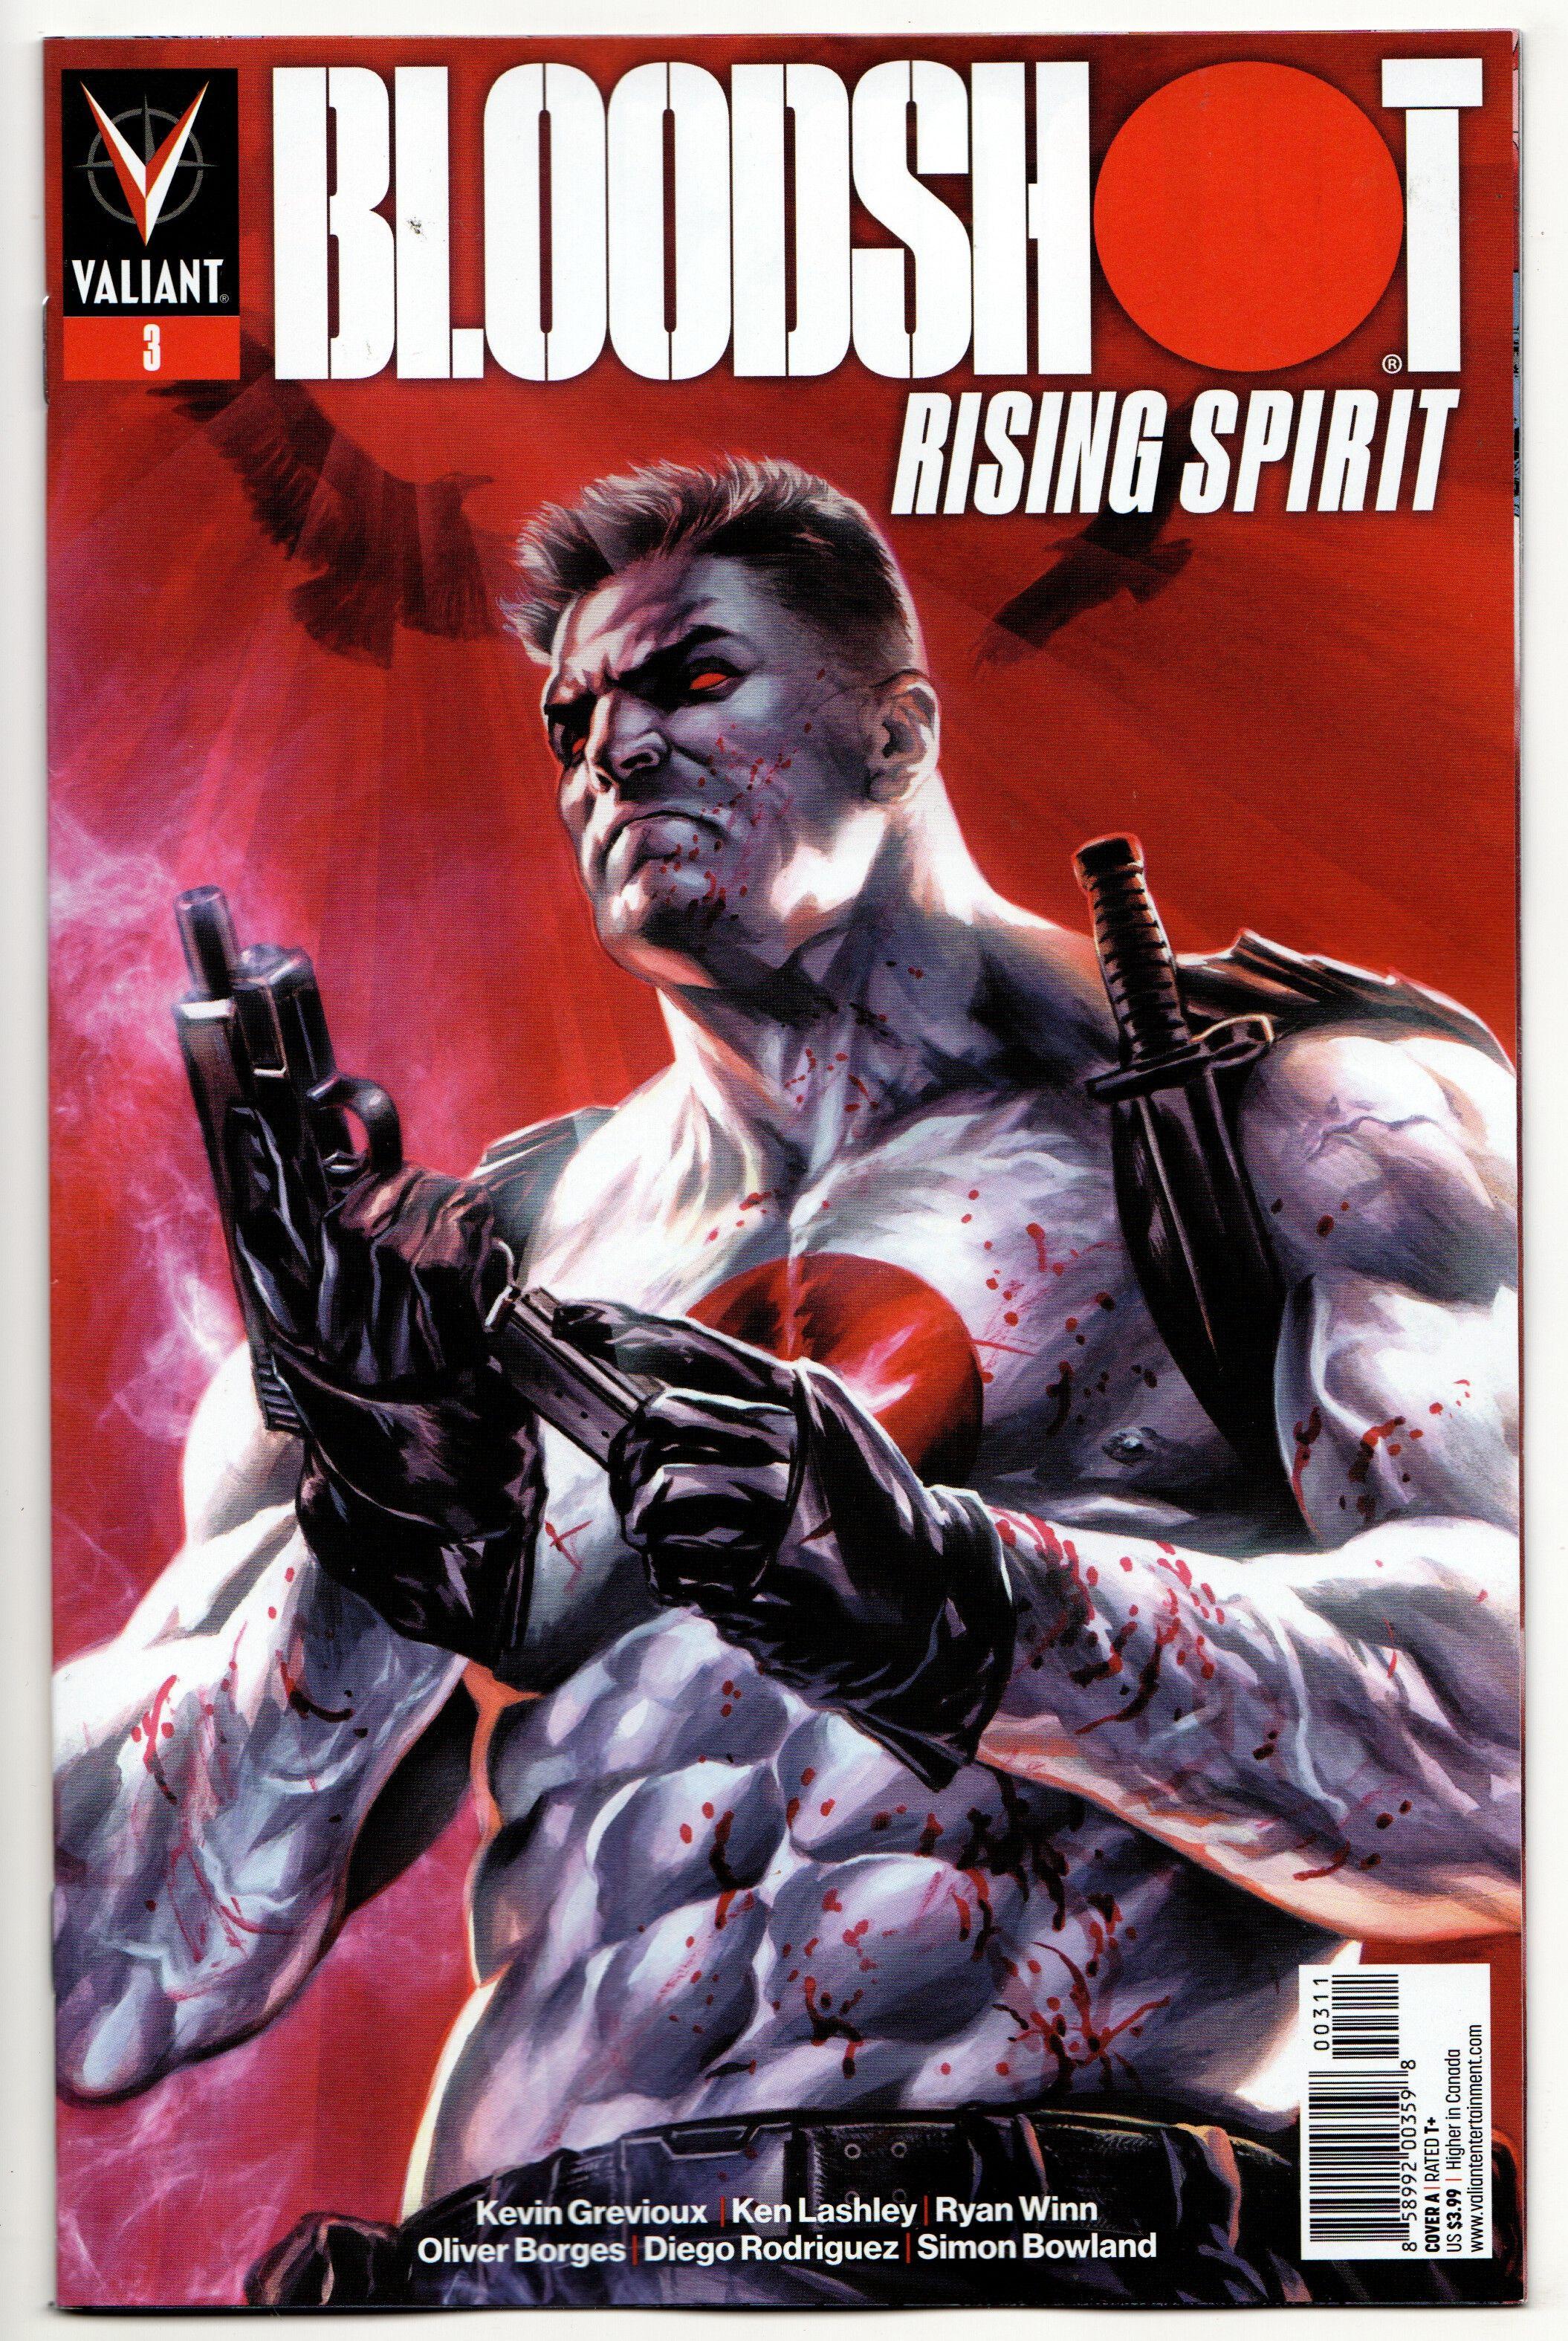 2.39 Bloodshot Rising Spirit 3 Cvr A (Valiant, 2019) NM